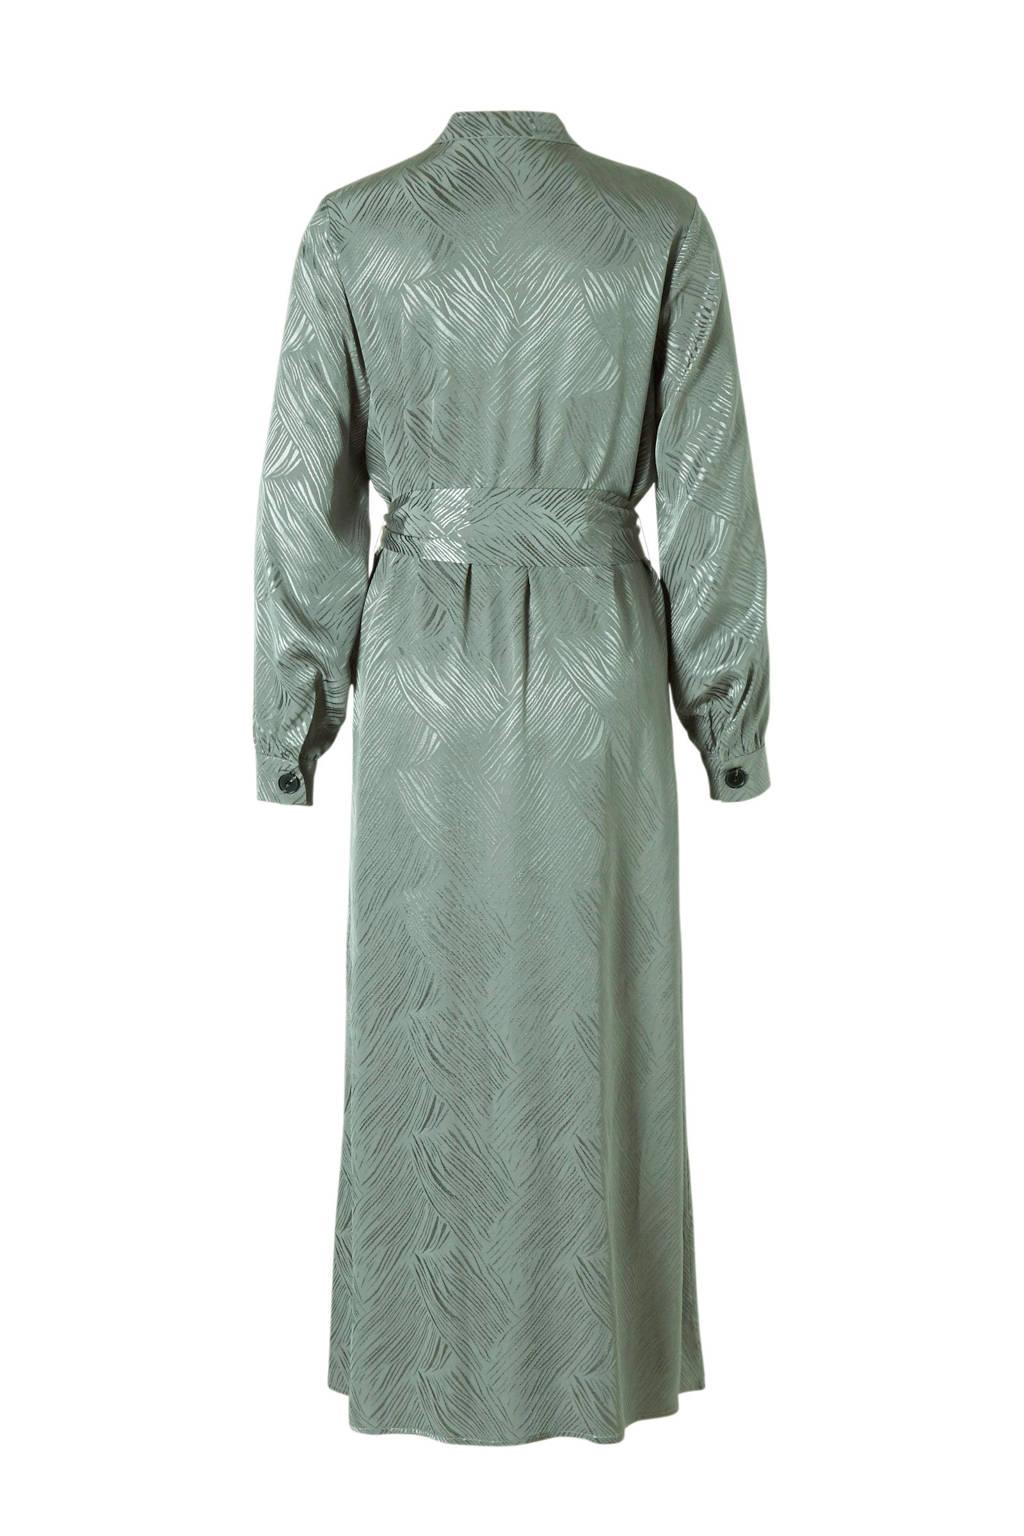 Verwonderend mint&berry maxi jurk   wehkamp PA-06